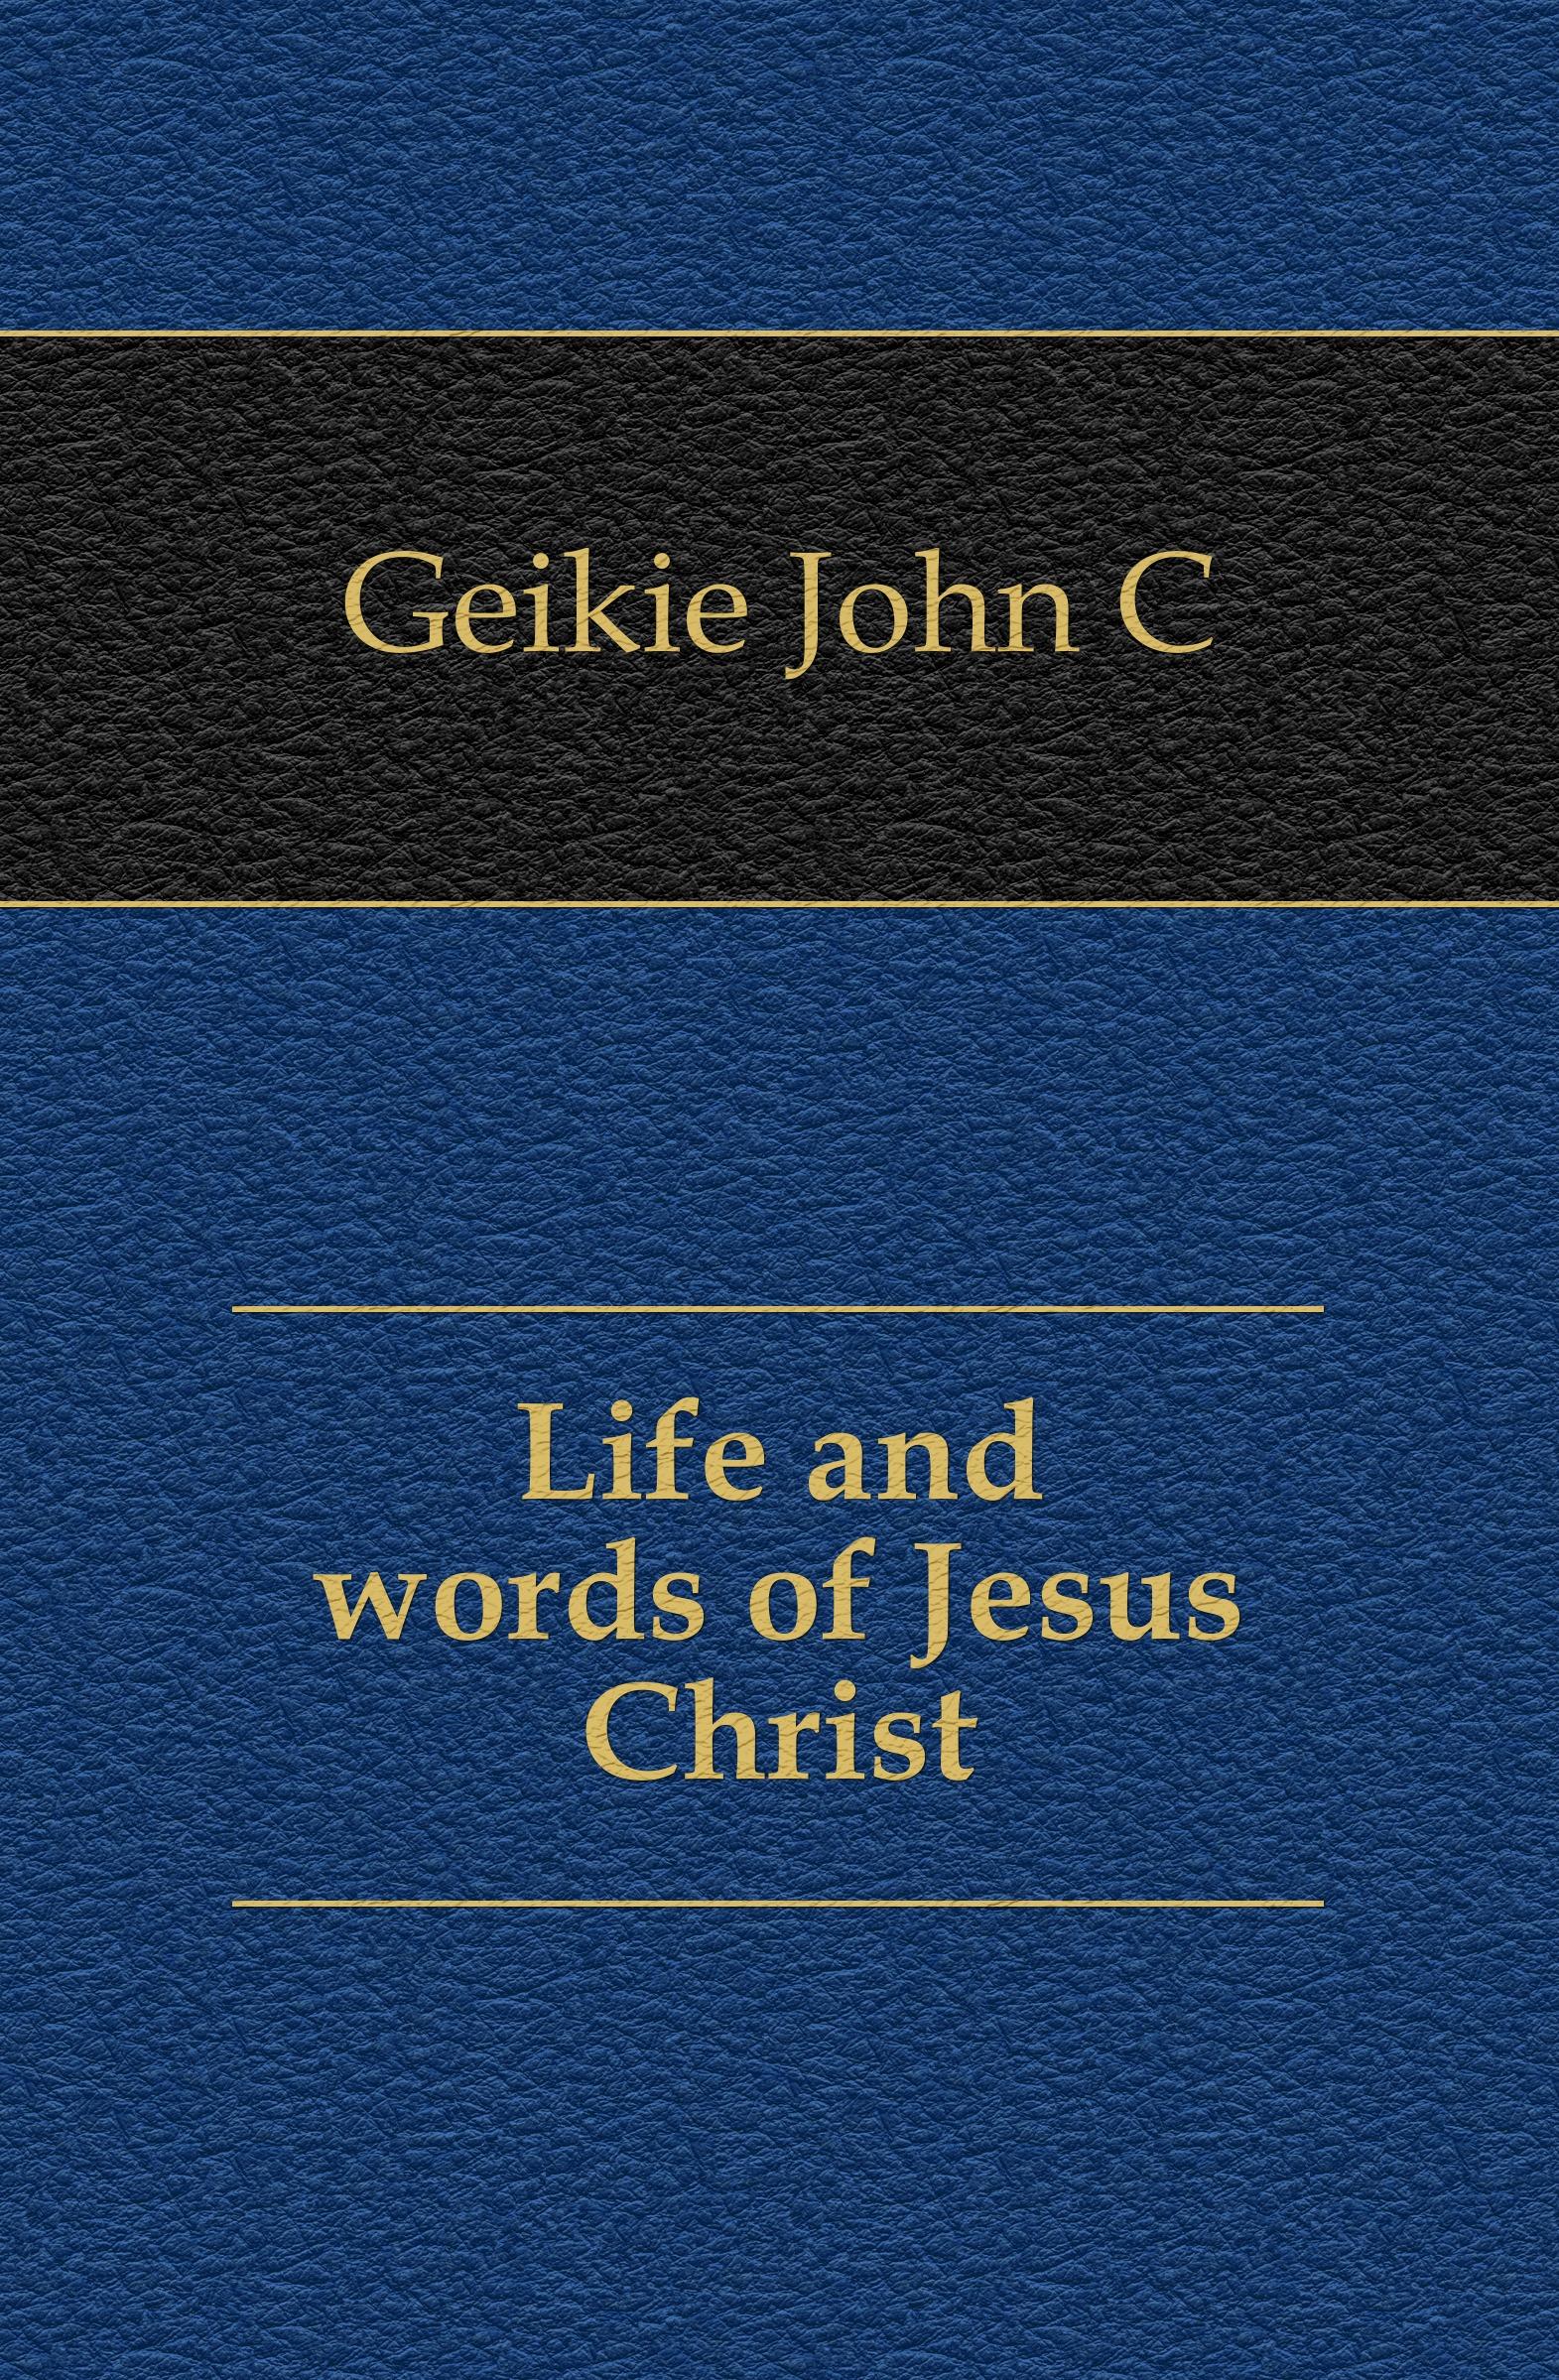 Geikie John Cunningham Life and words of Jesus Christ john cunningham geikie hours